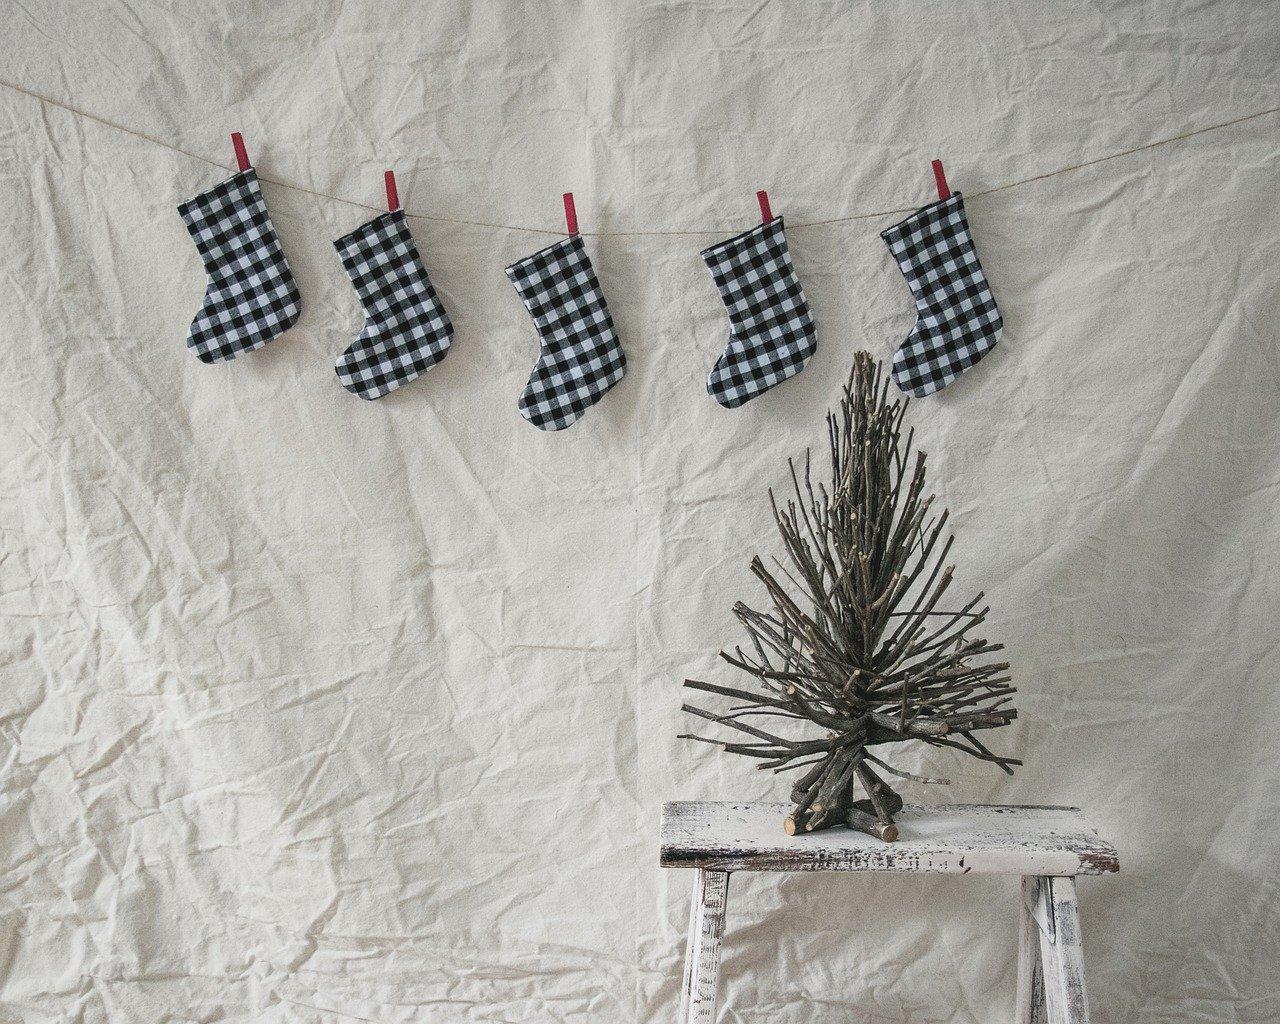 Christmas stockings hanging